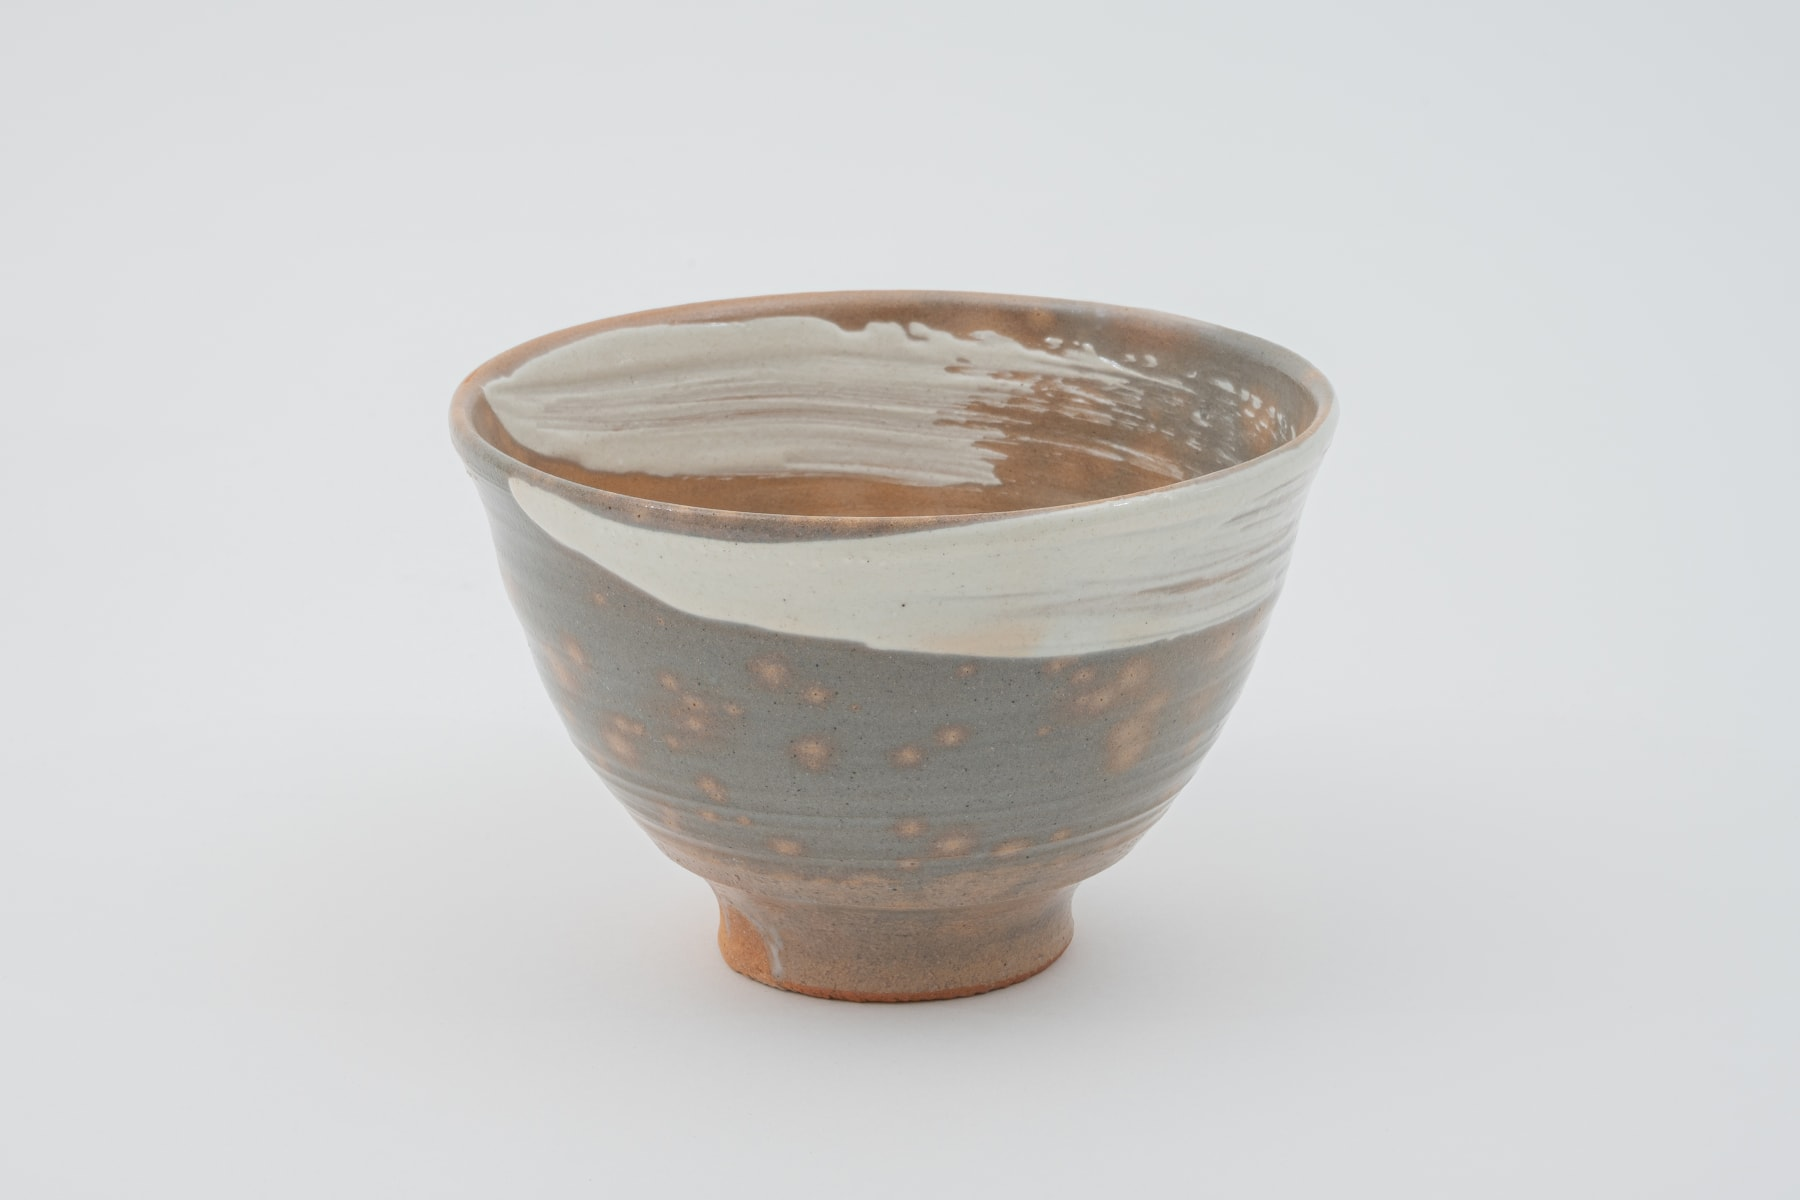 Hosai Matsubayashi XVI, Kase Tea bowl (red deer back, brush stroke) / 茶盌 紅鹿背刷毛目, 2020